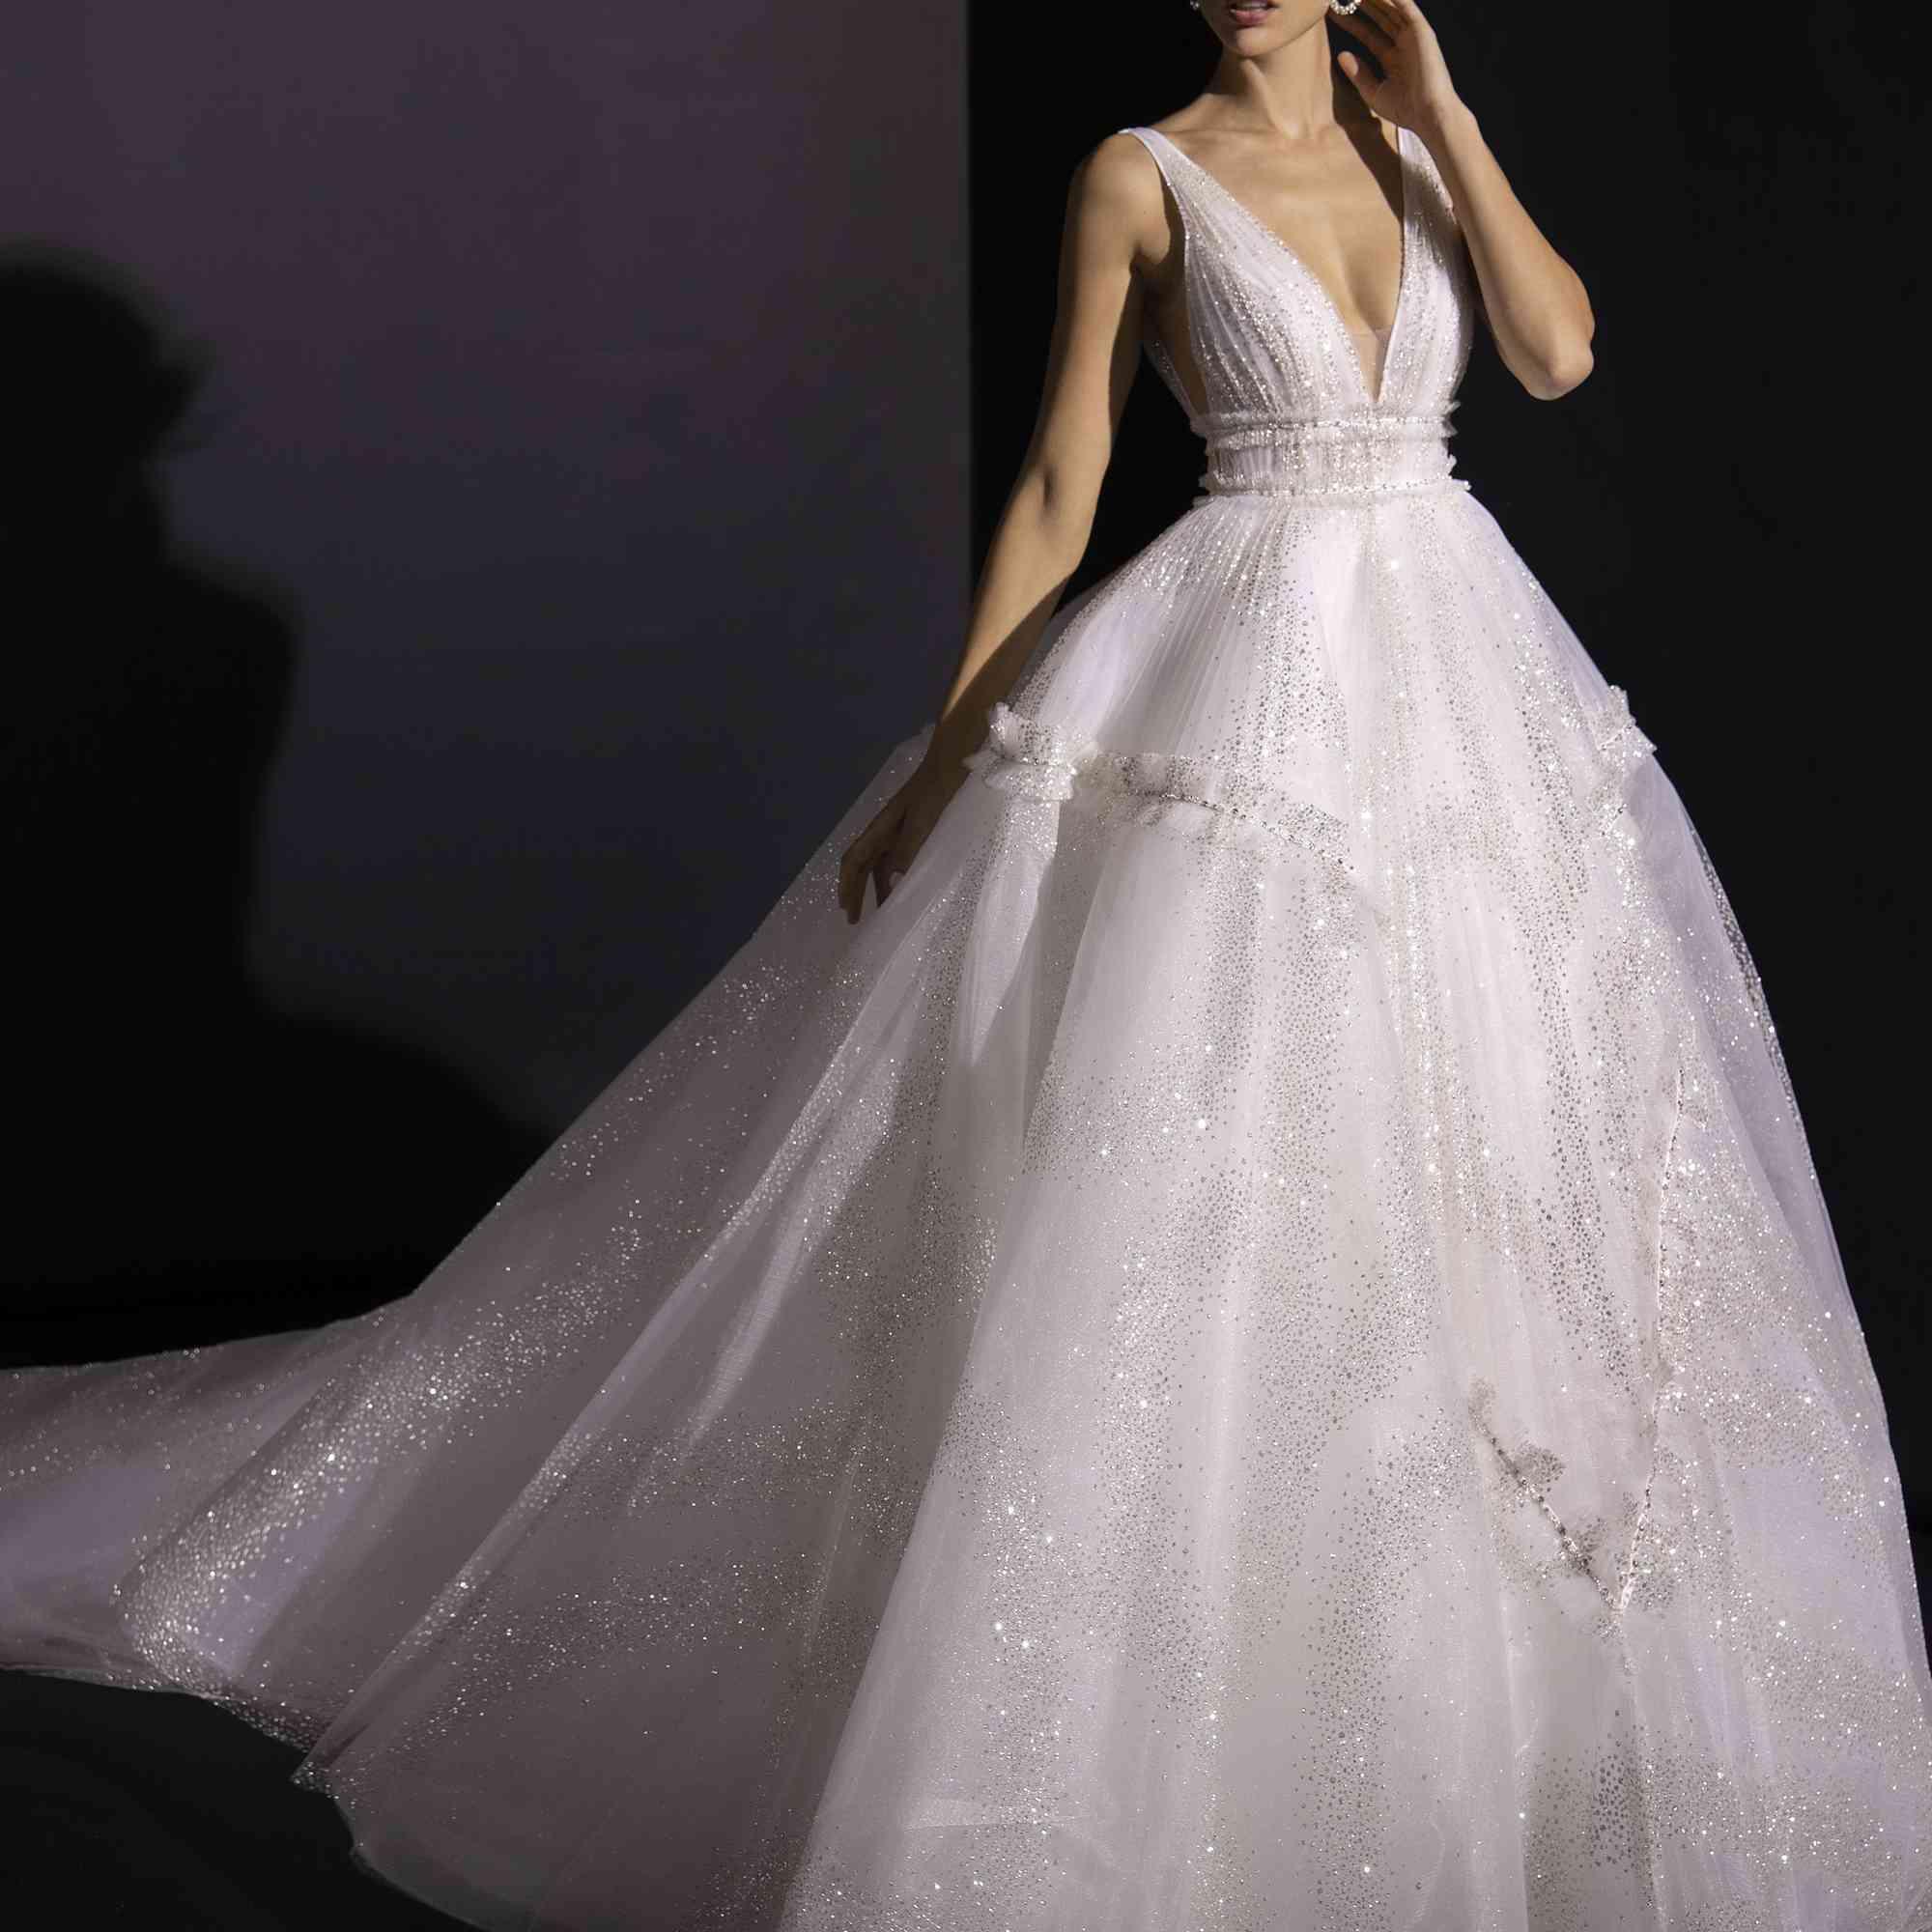 Model in voluminous glitter tulle ballgown with deep V neck